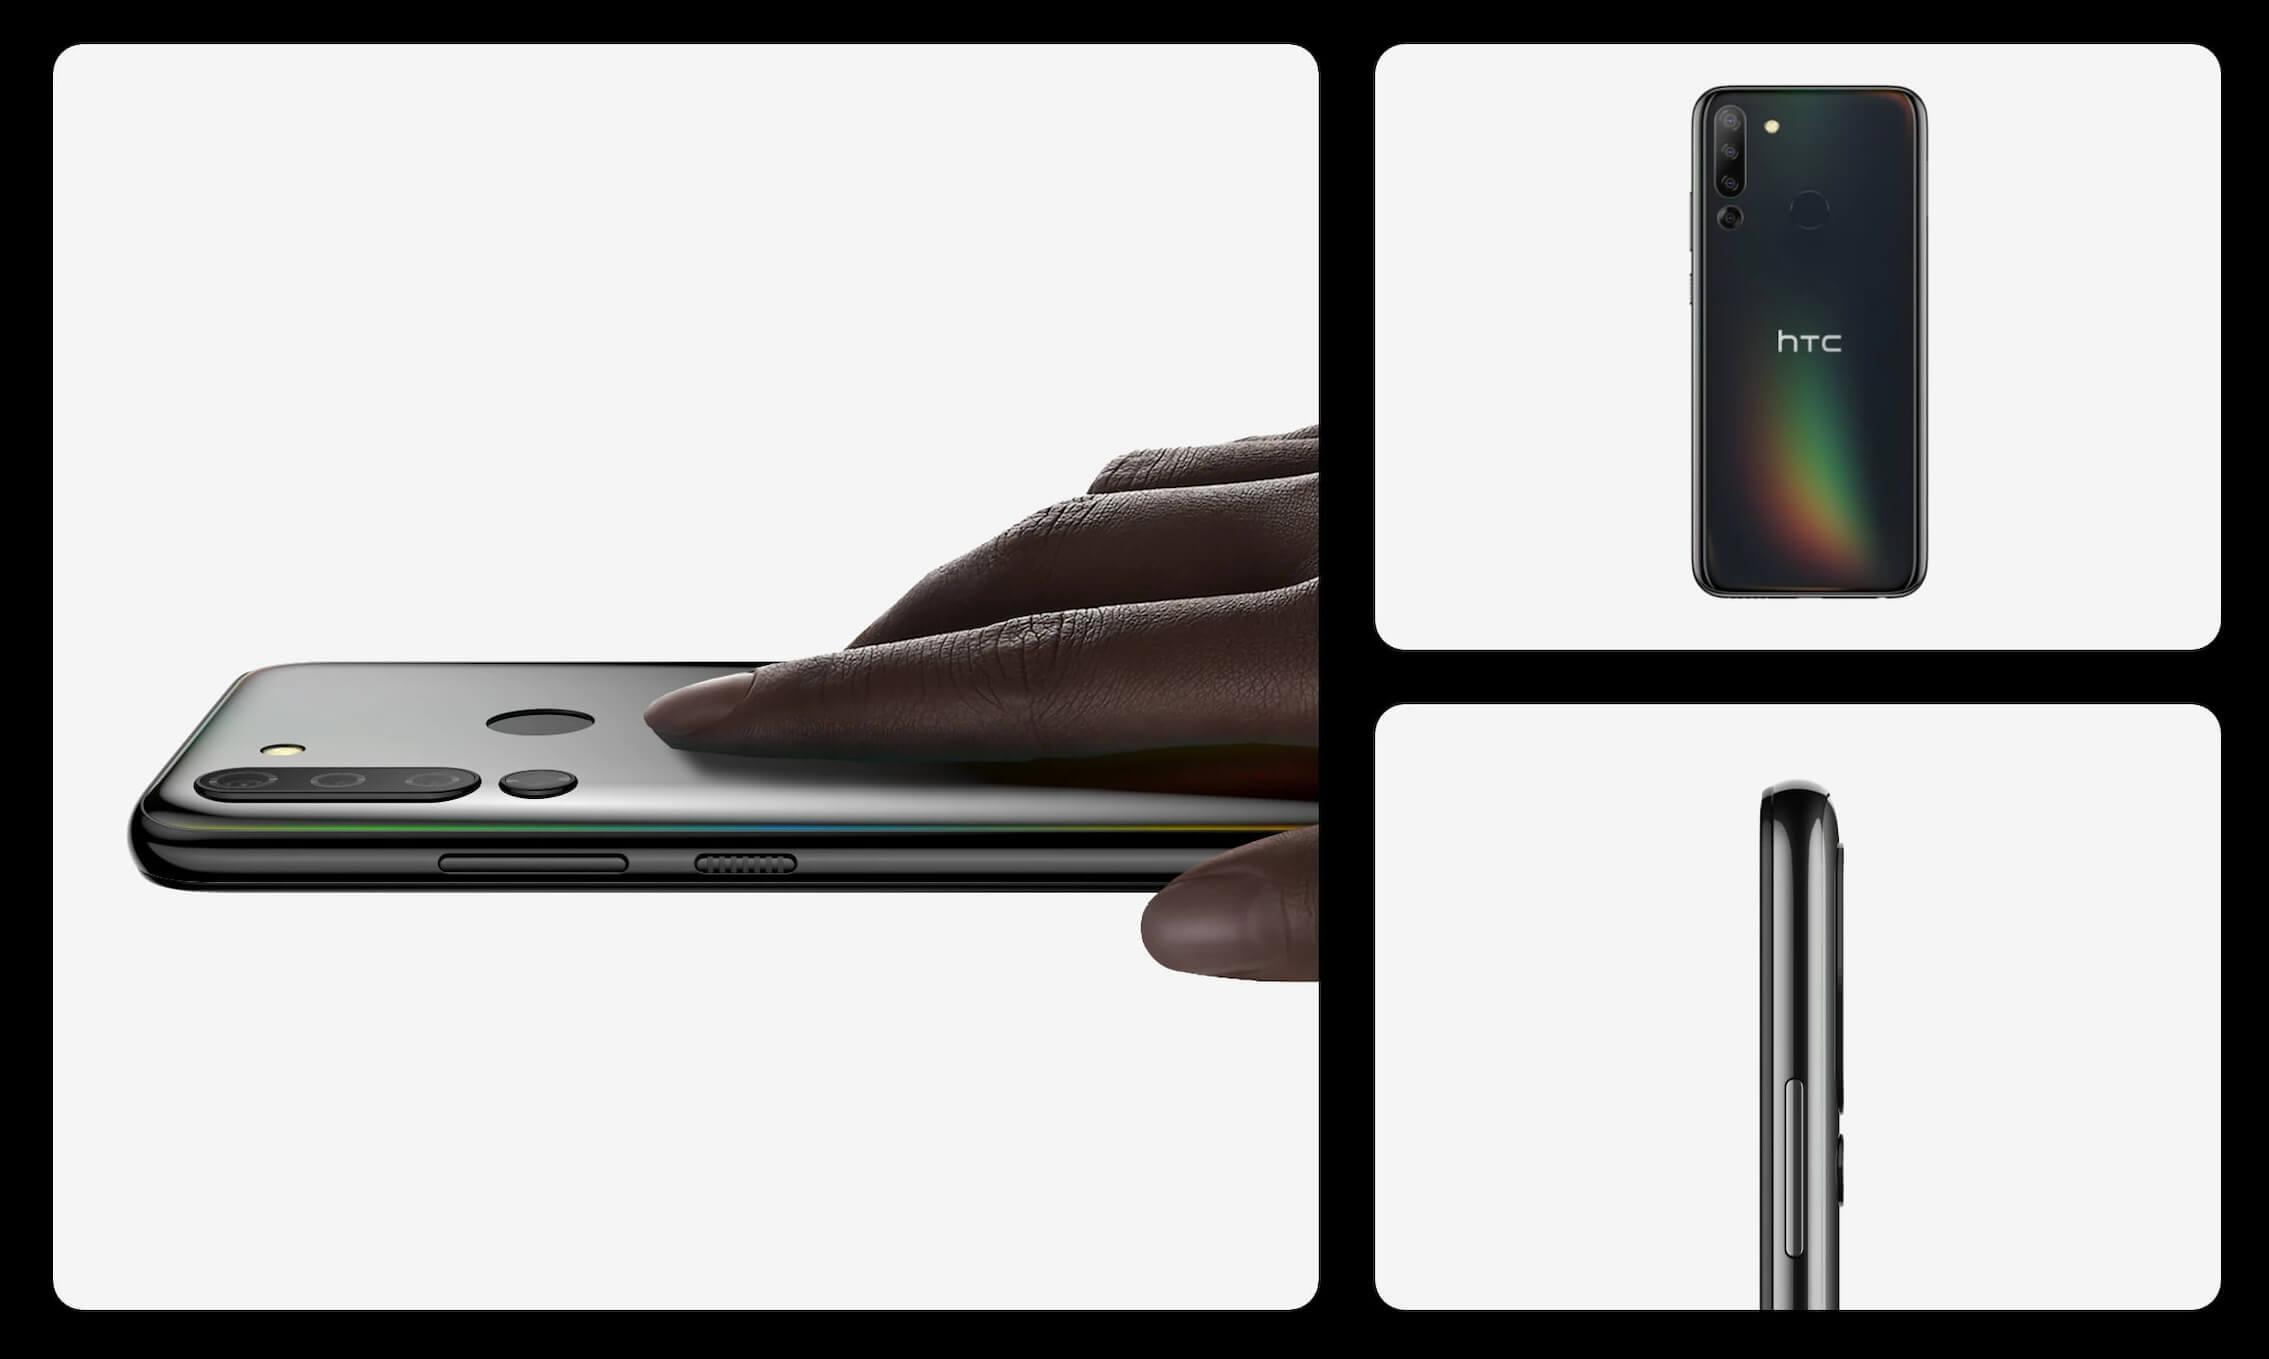 HTC представила в России смартфон Wildfire E3